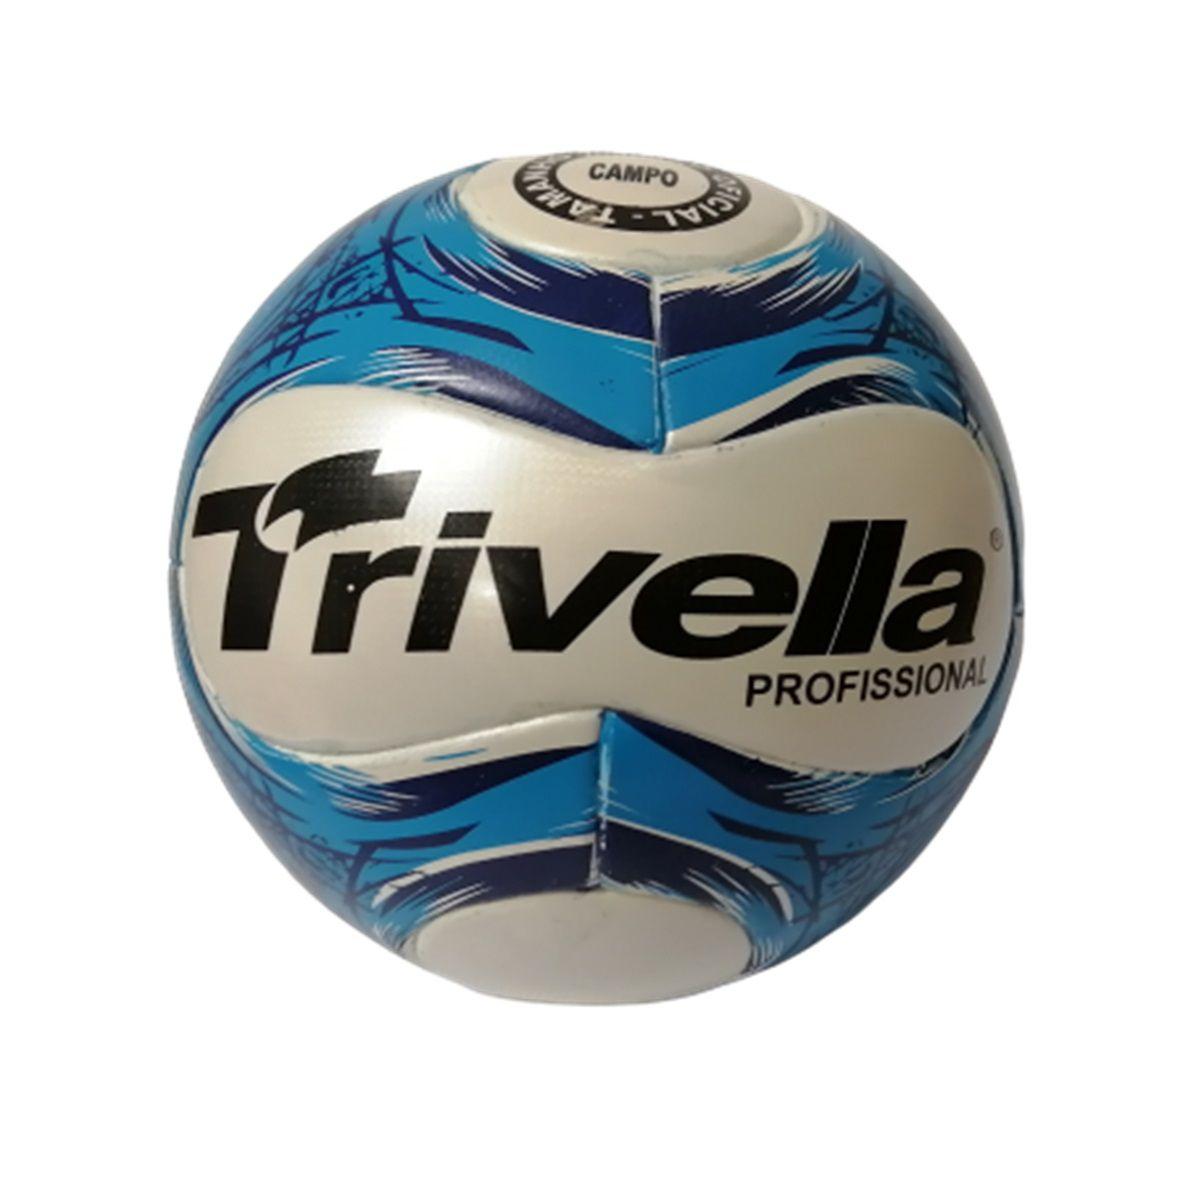 Kit C/3 Bolas Campo Trivella 100% PU Profissional